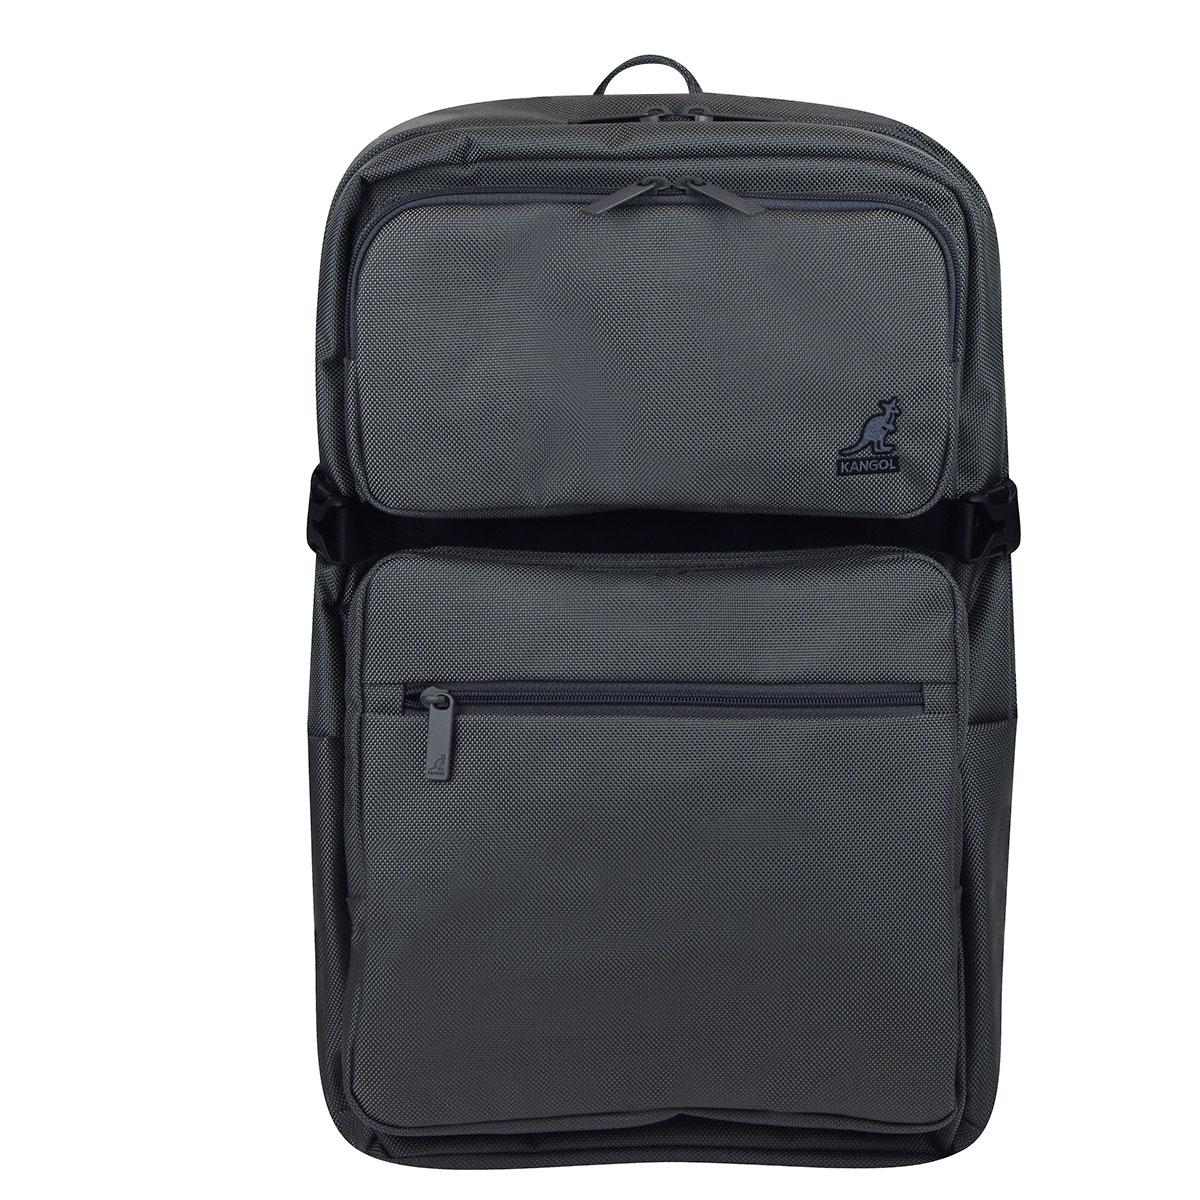 Kangol Tass Backpack in Grey